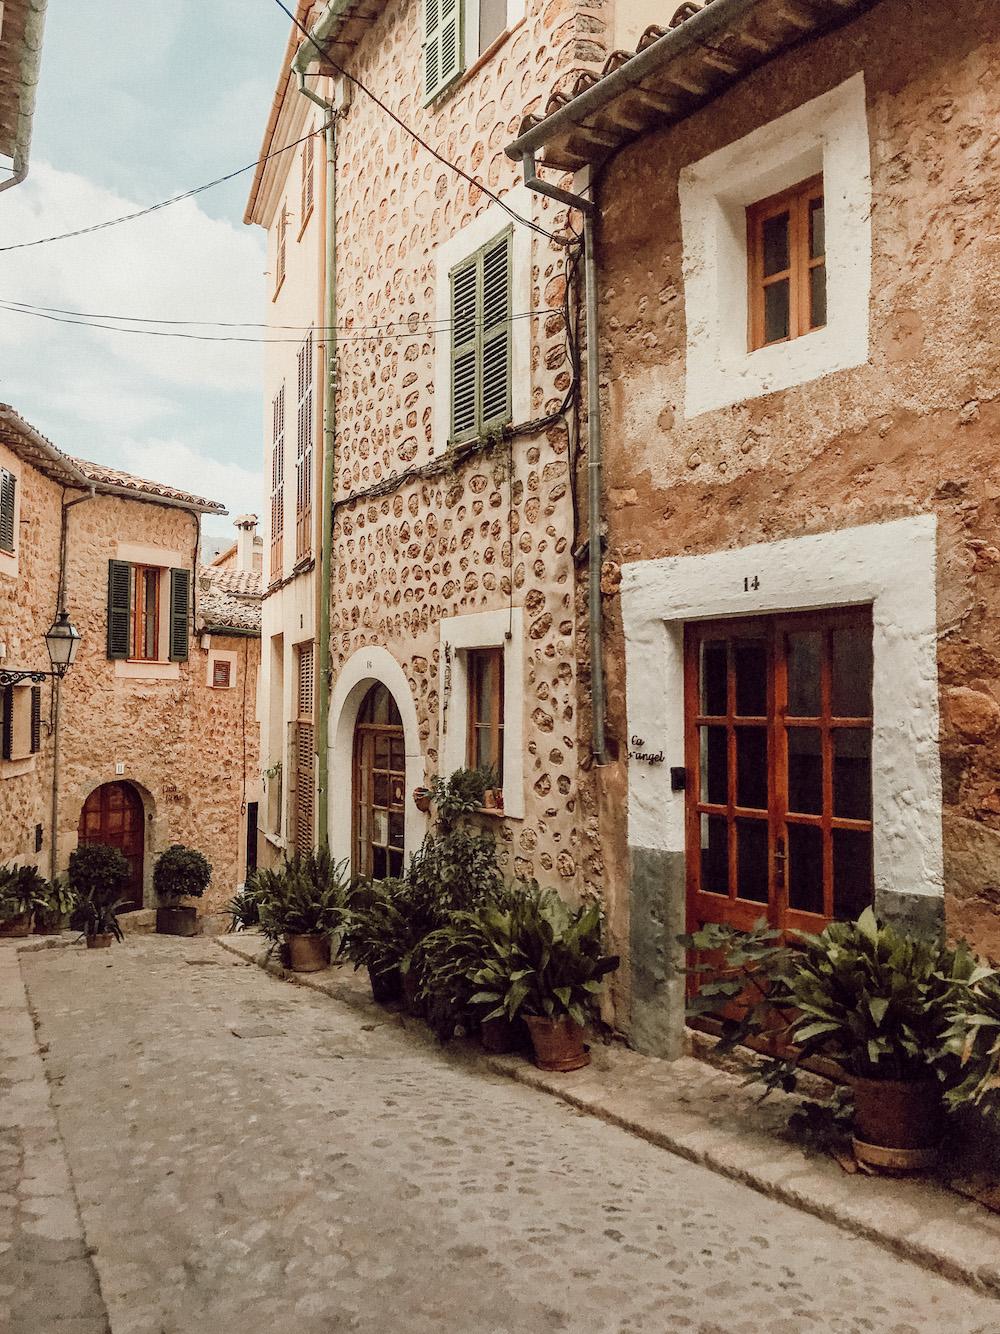 Sehenswerte Orte Mallorca Dörfer Städte Traveldiary Reisetipps Empfehlung Travelblog Bergdorf Biniaraix